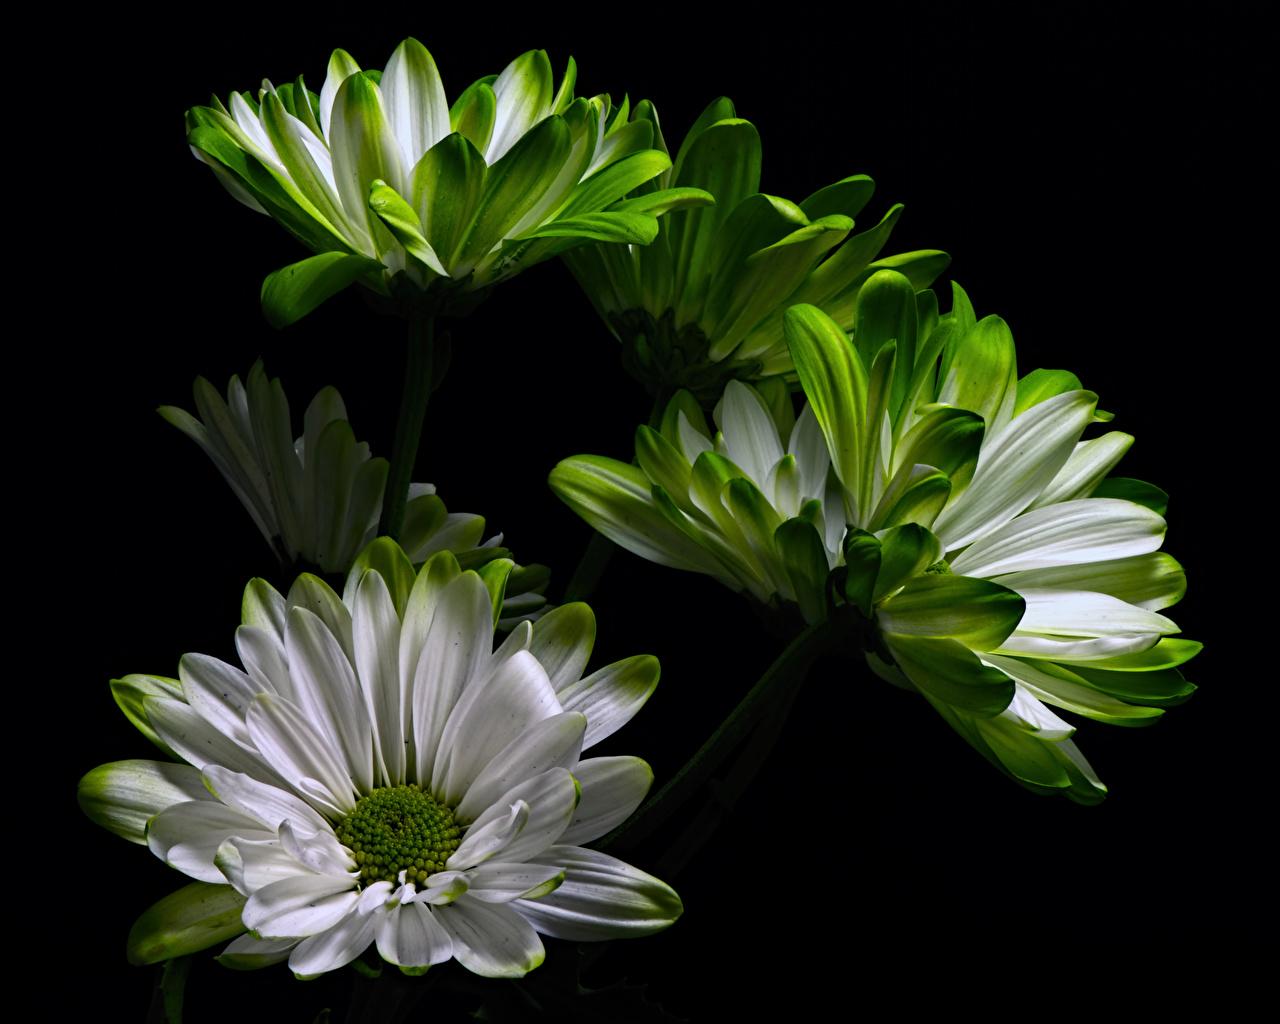 Bilder blomma krysantemumsläktet Närbild Svart bakgrund Blommor Krysantemum